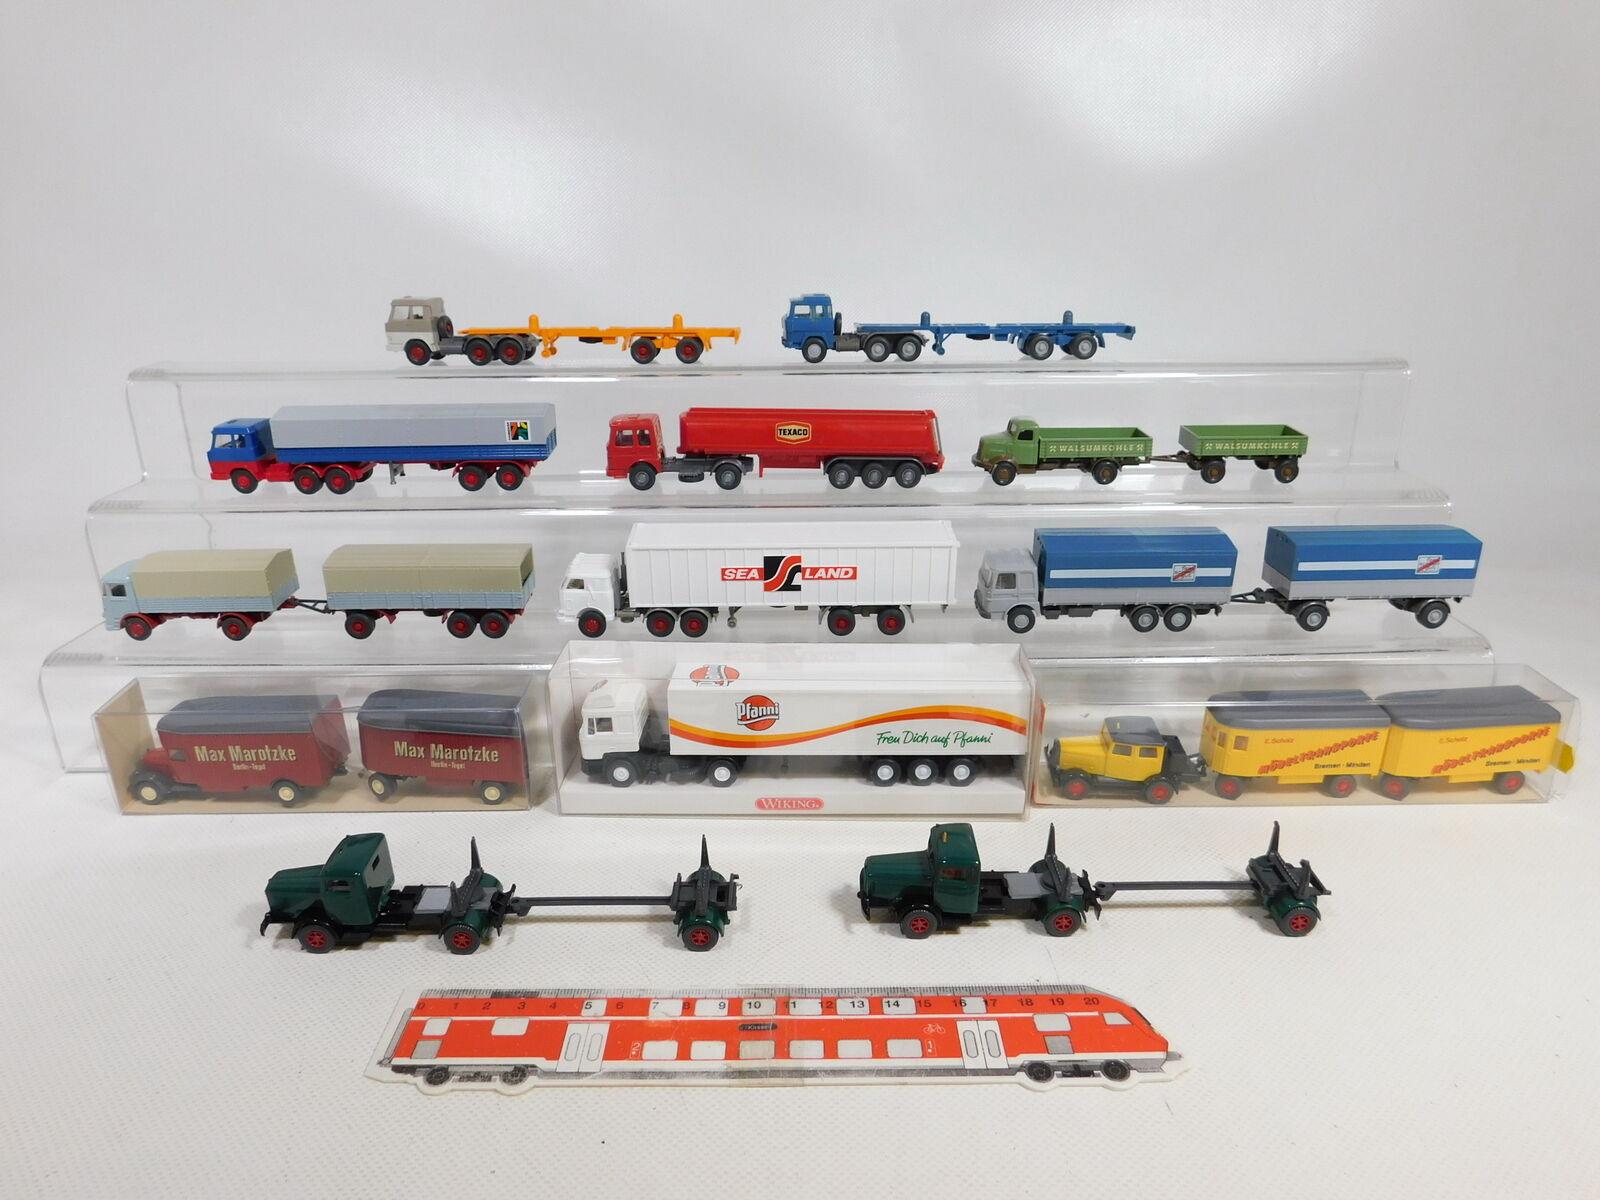 Ca549-1  13x Wiking 1 87 h0 camion  On + Büssing + HANOMAG etc, 2. Choix bien